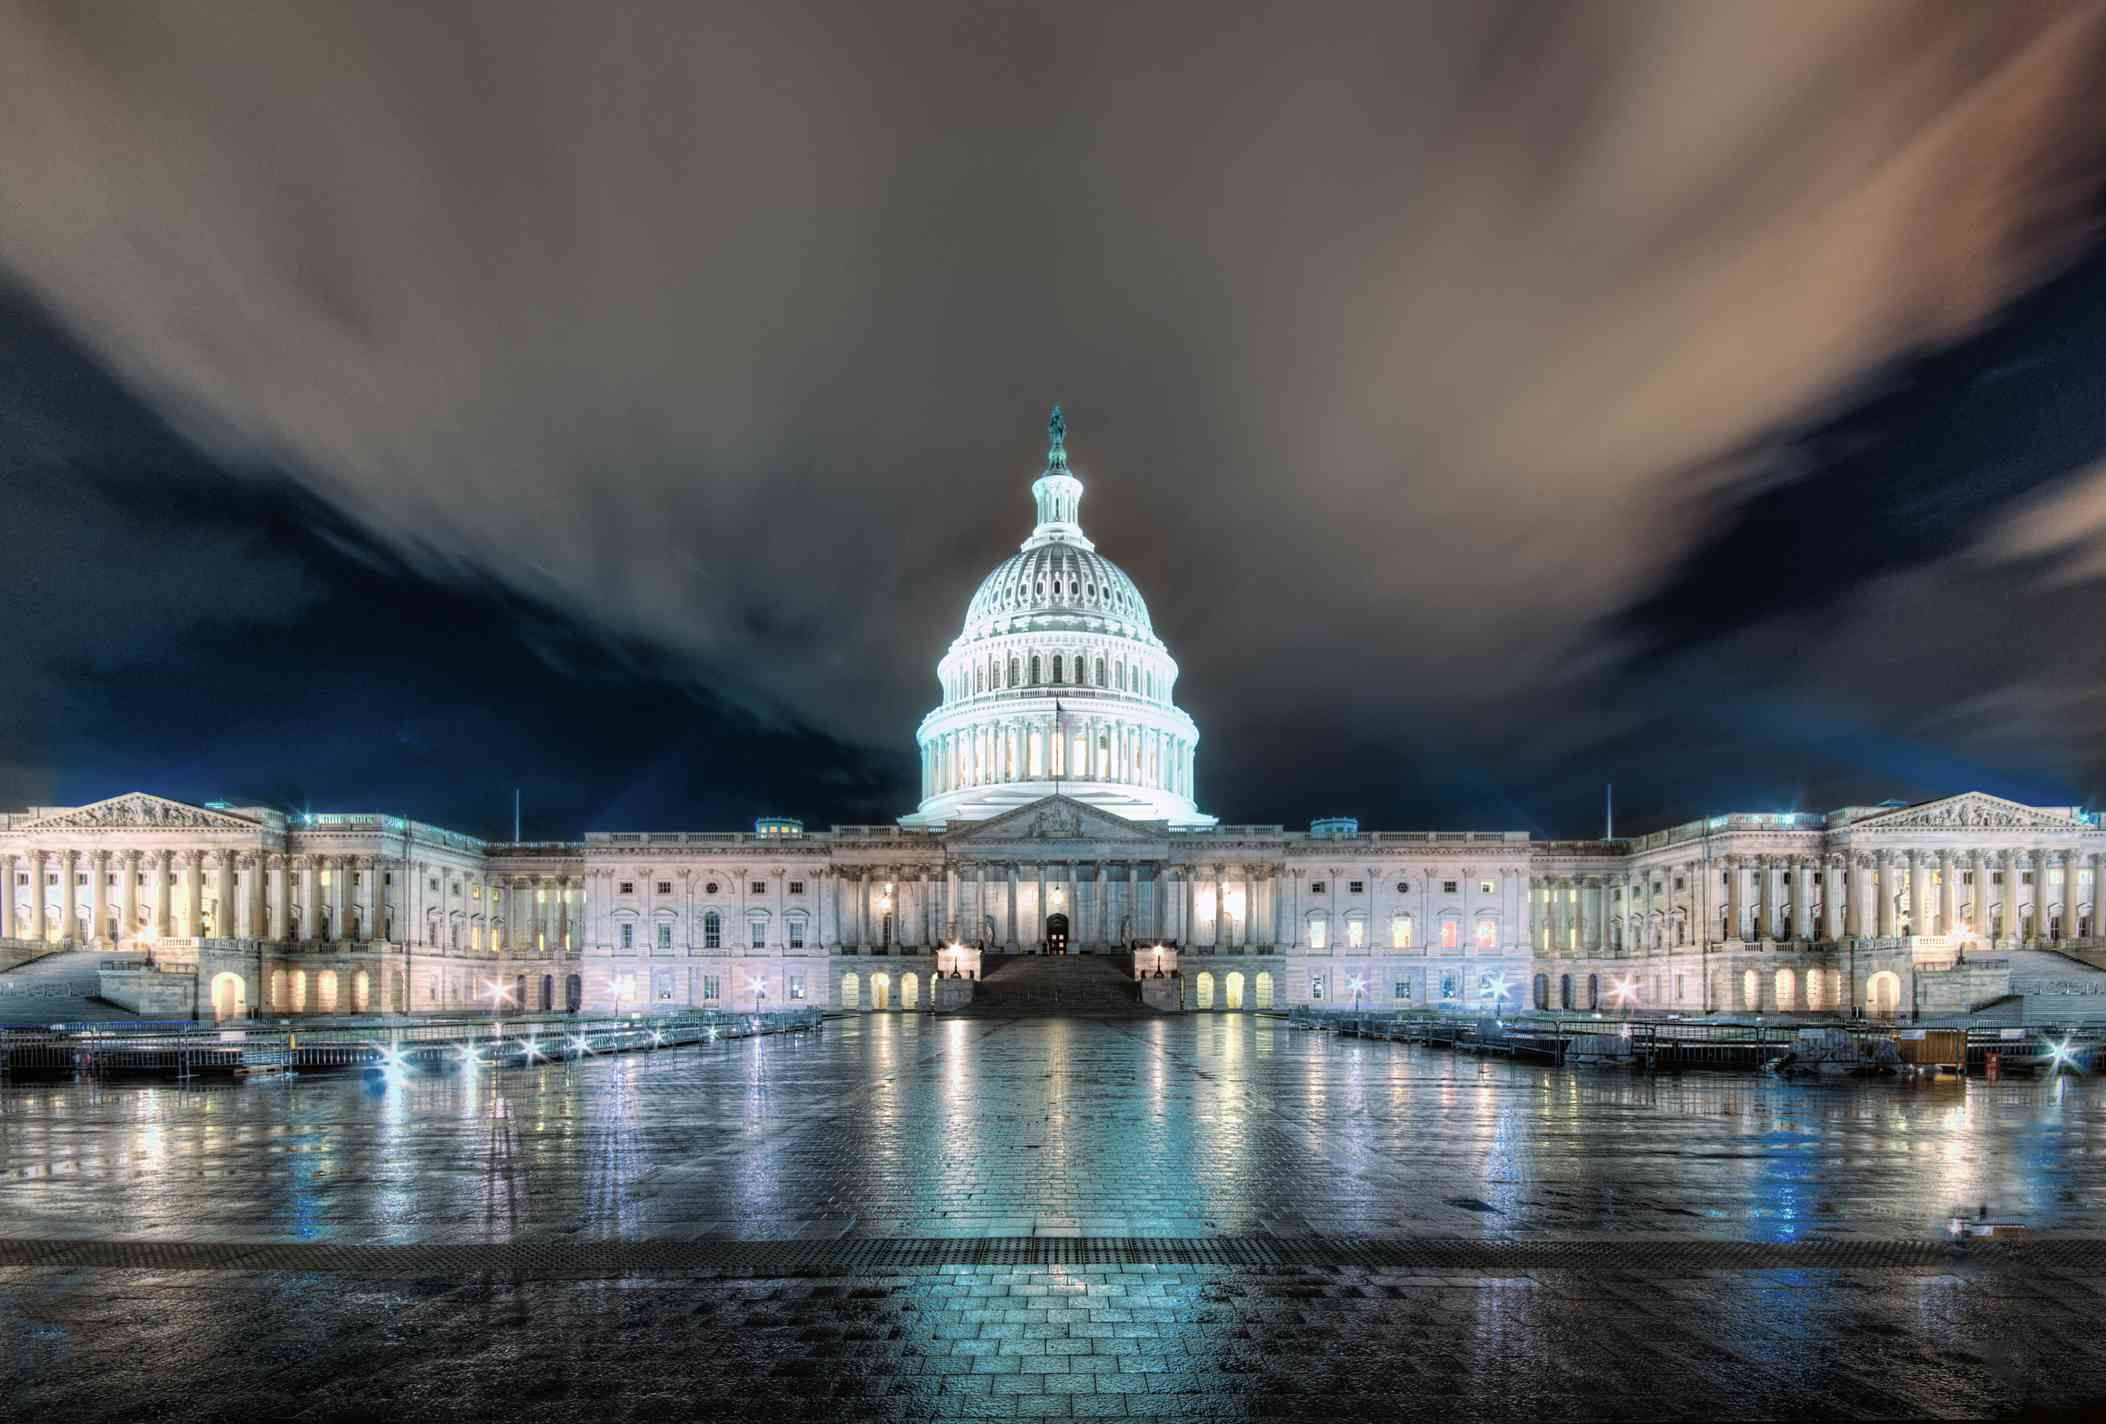 Washington DC Capitol building captured at night